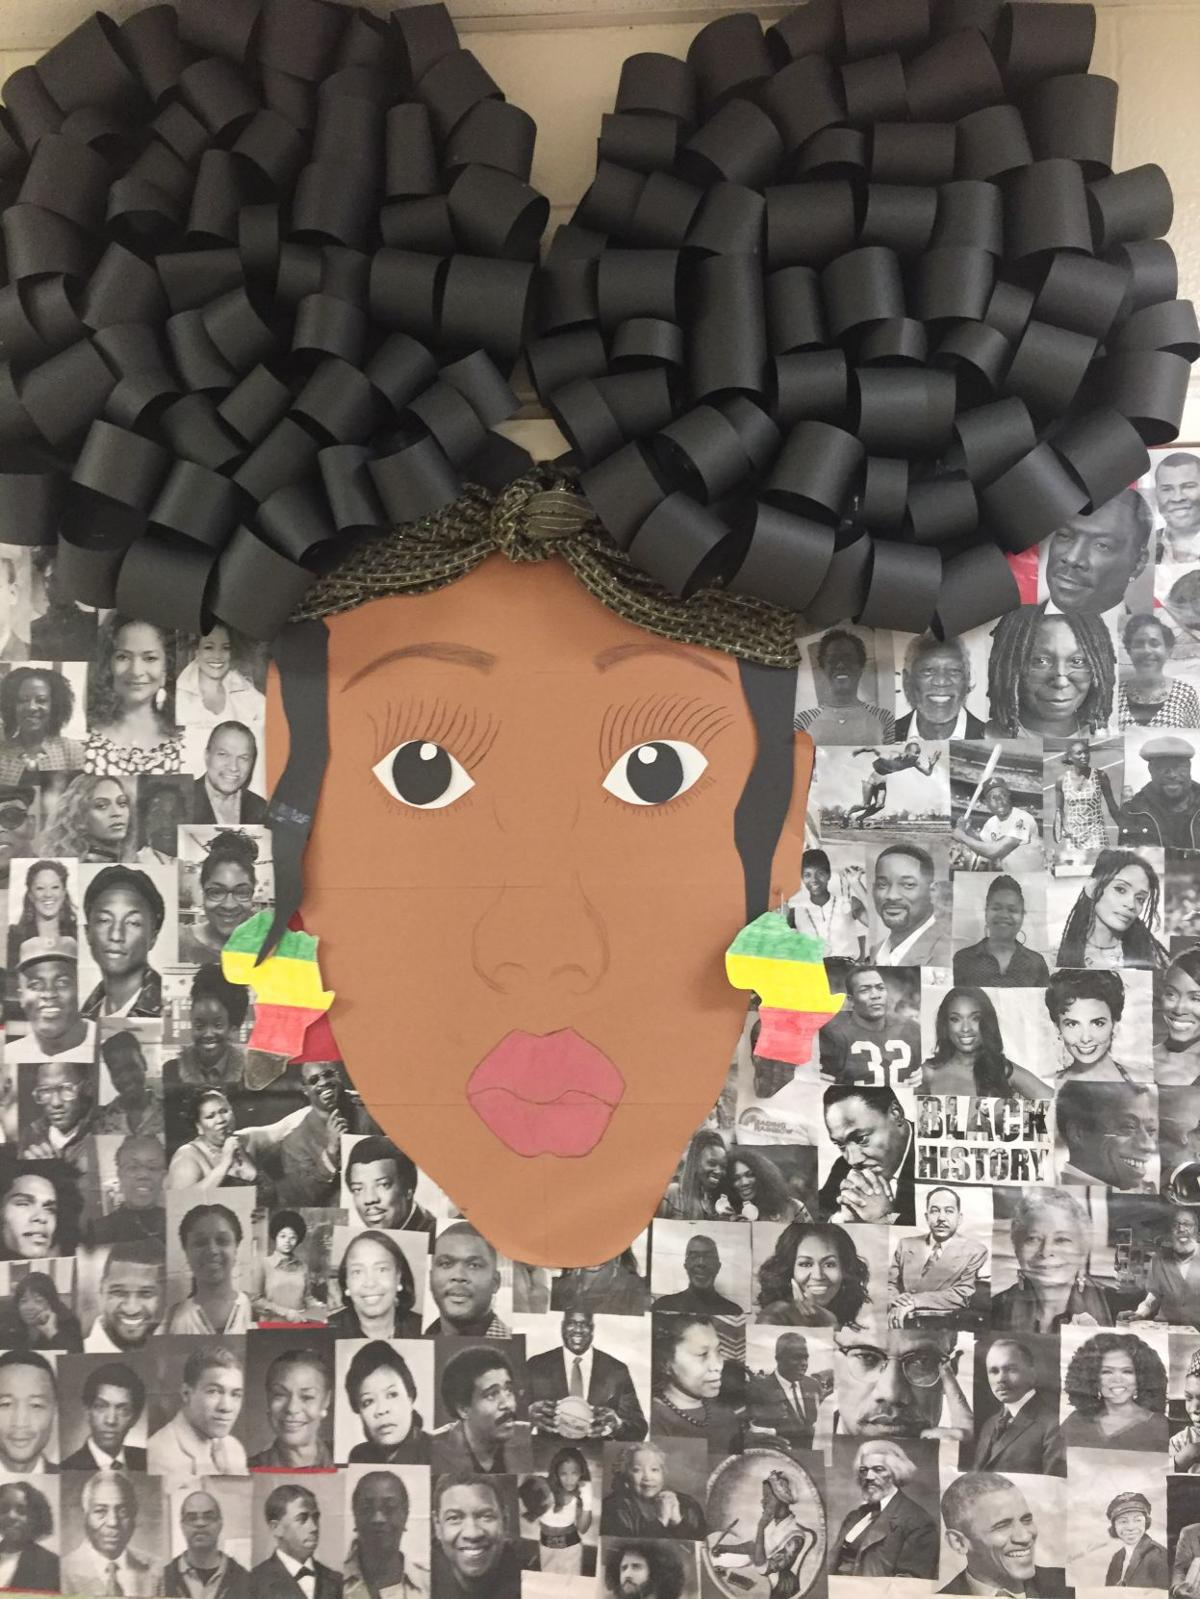 030719_pab_heritage african american